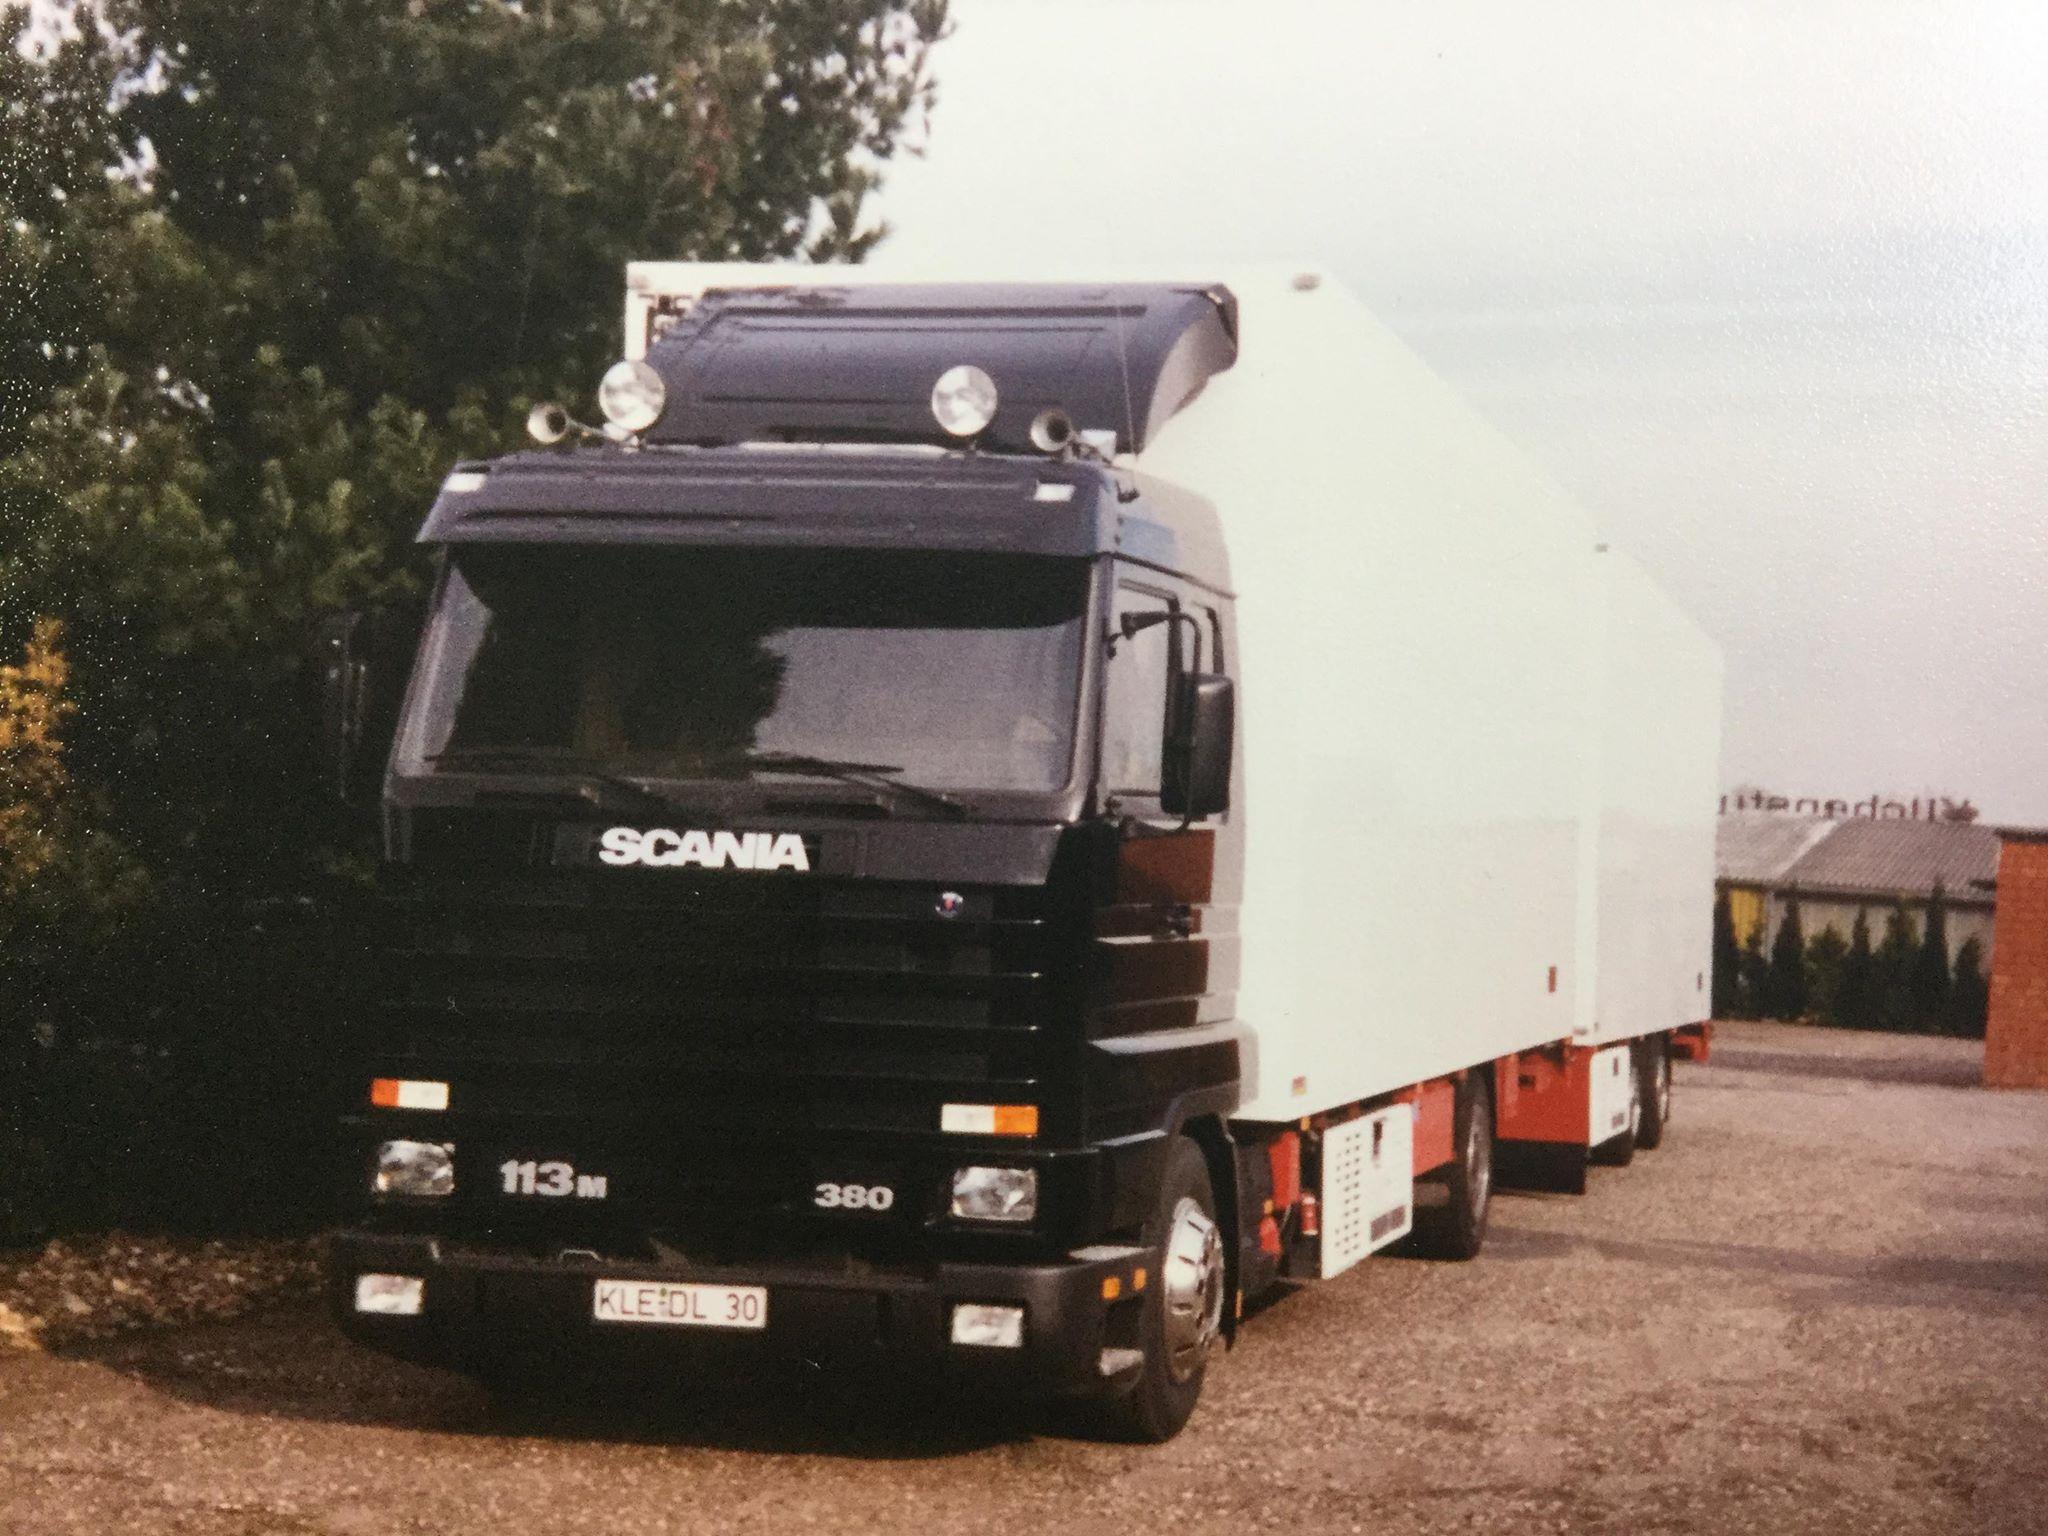 Scania-113M-3